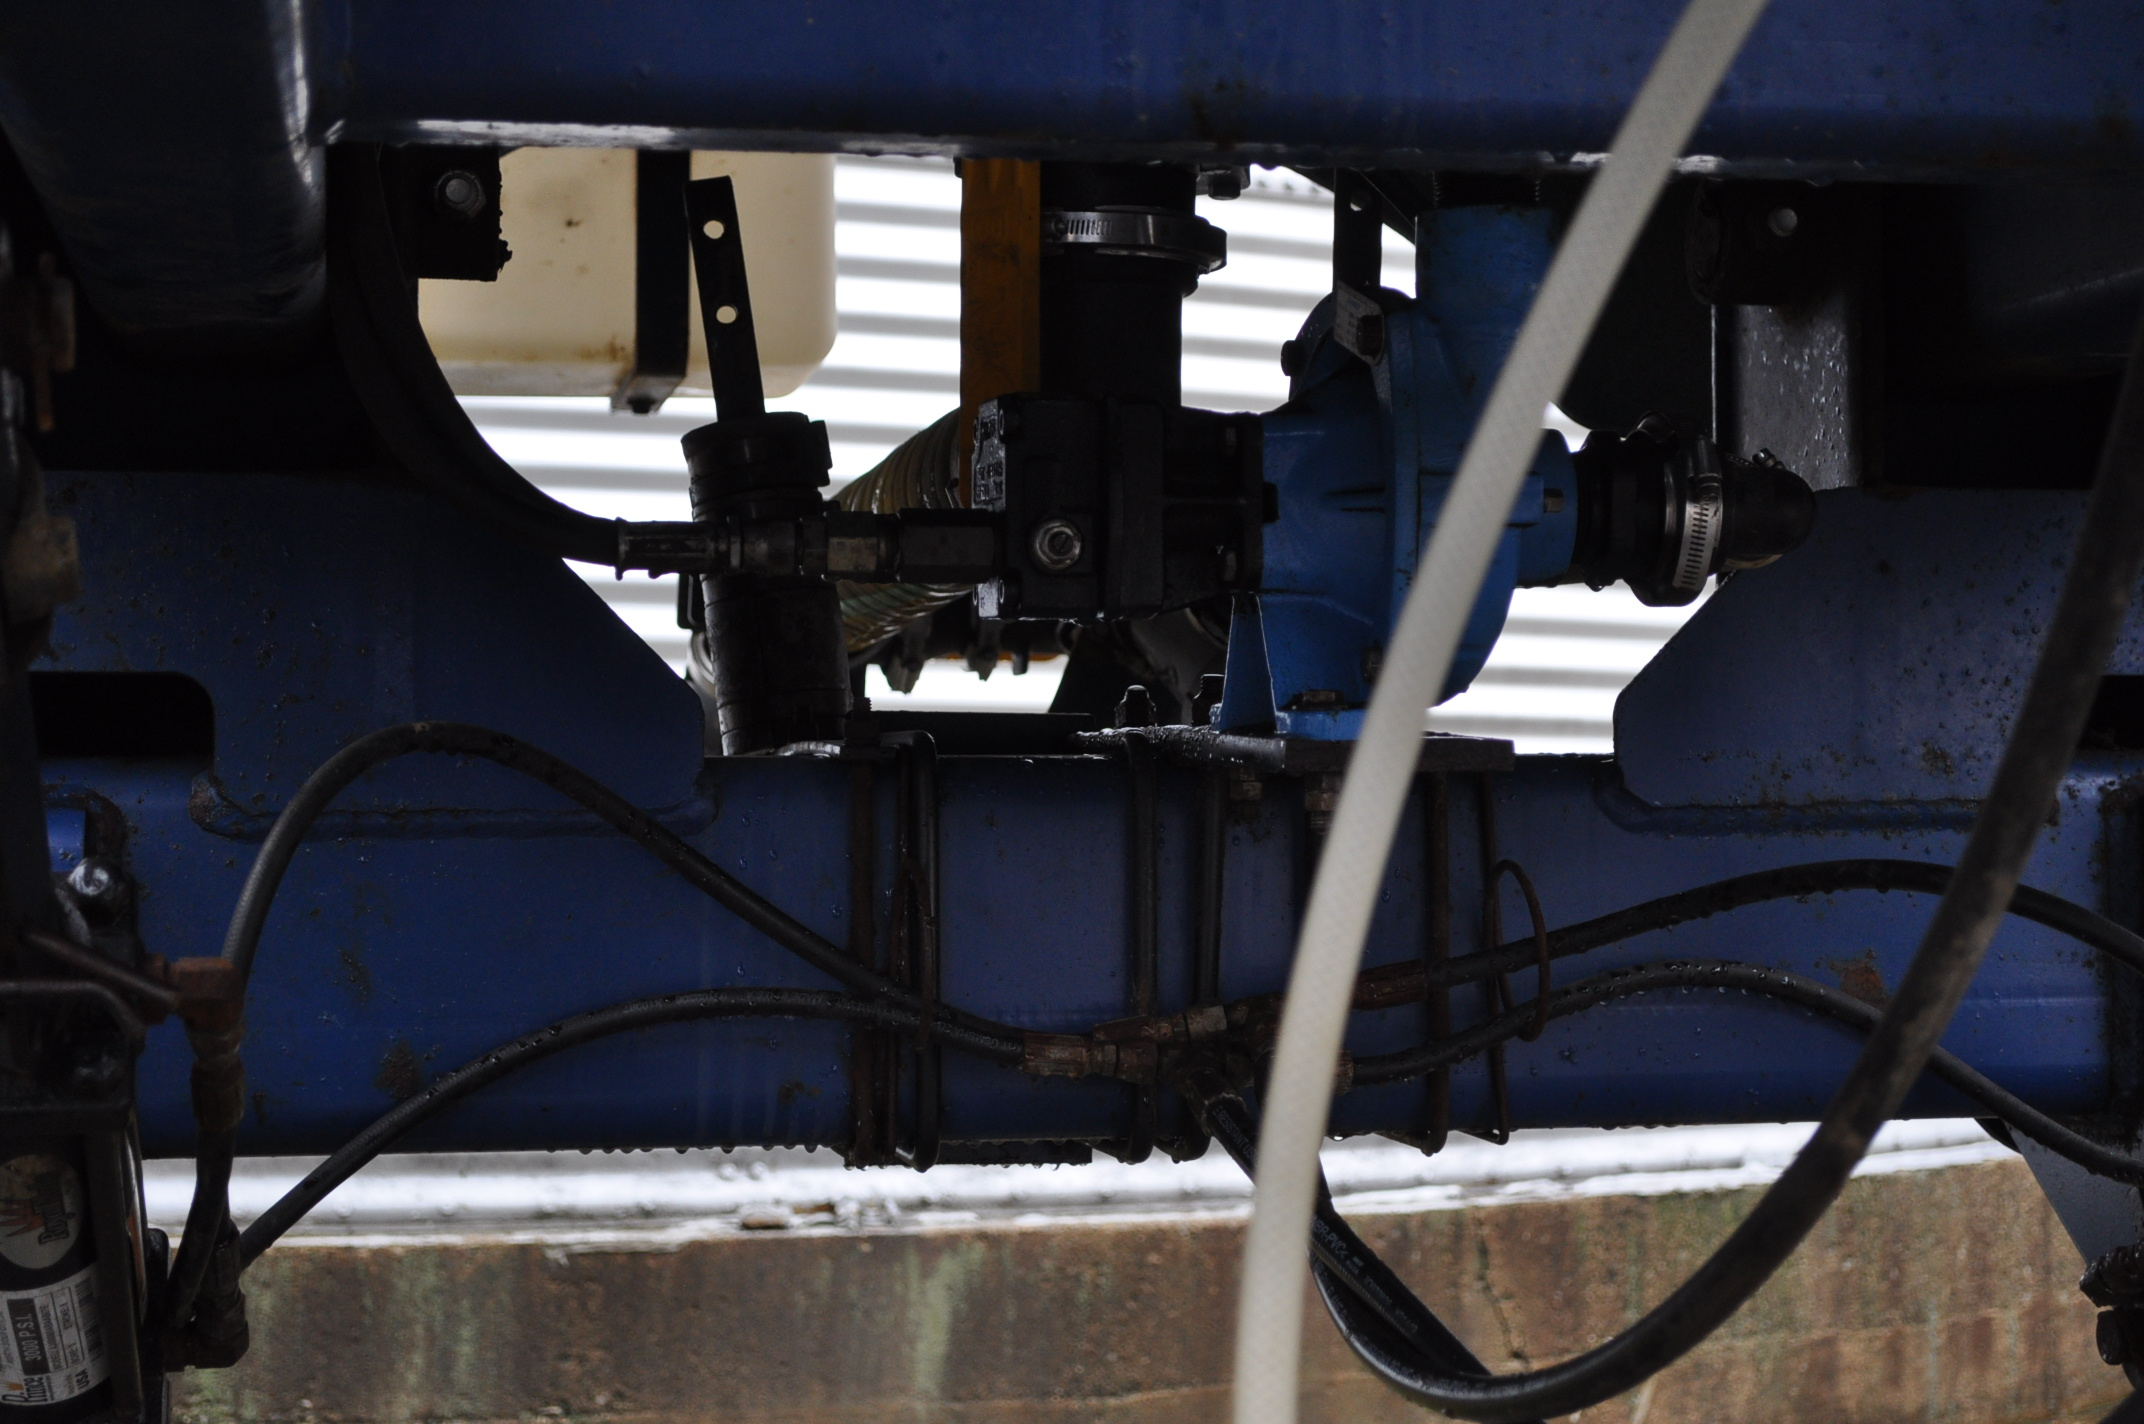 Blu-Jet AT 4010 28% applicator, 12/16 row, 1200 gal poly tank, 320/90R46 tires, hyd drive pump, - Image 10 of 12